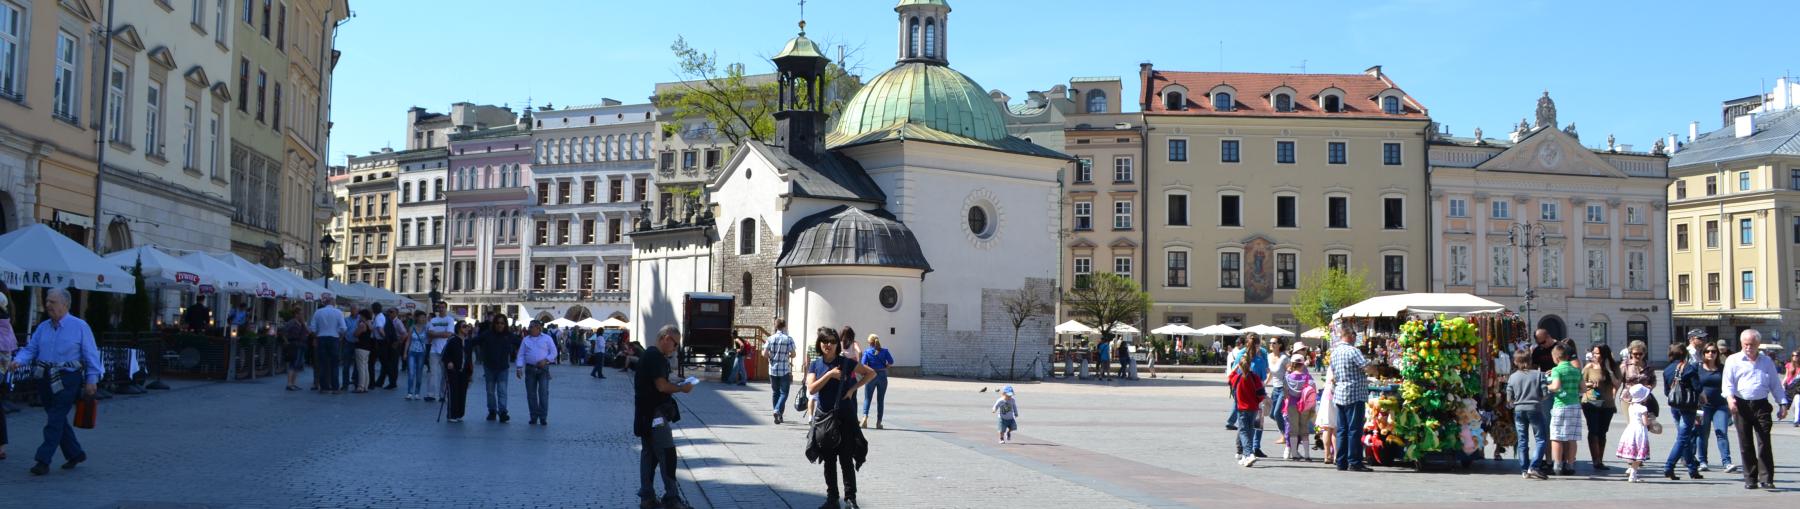 Krakau - het Marktplein